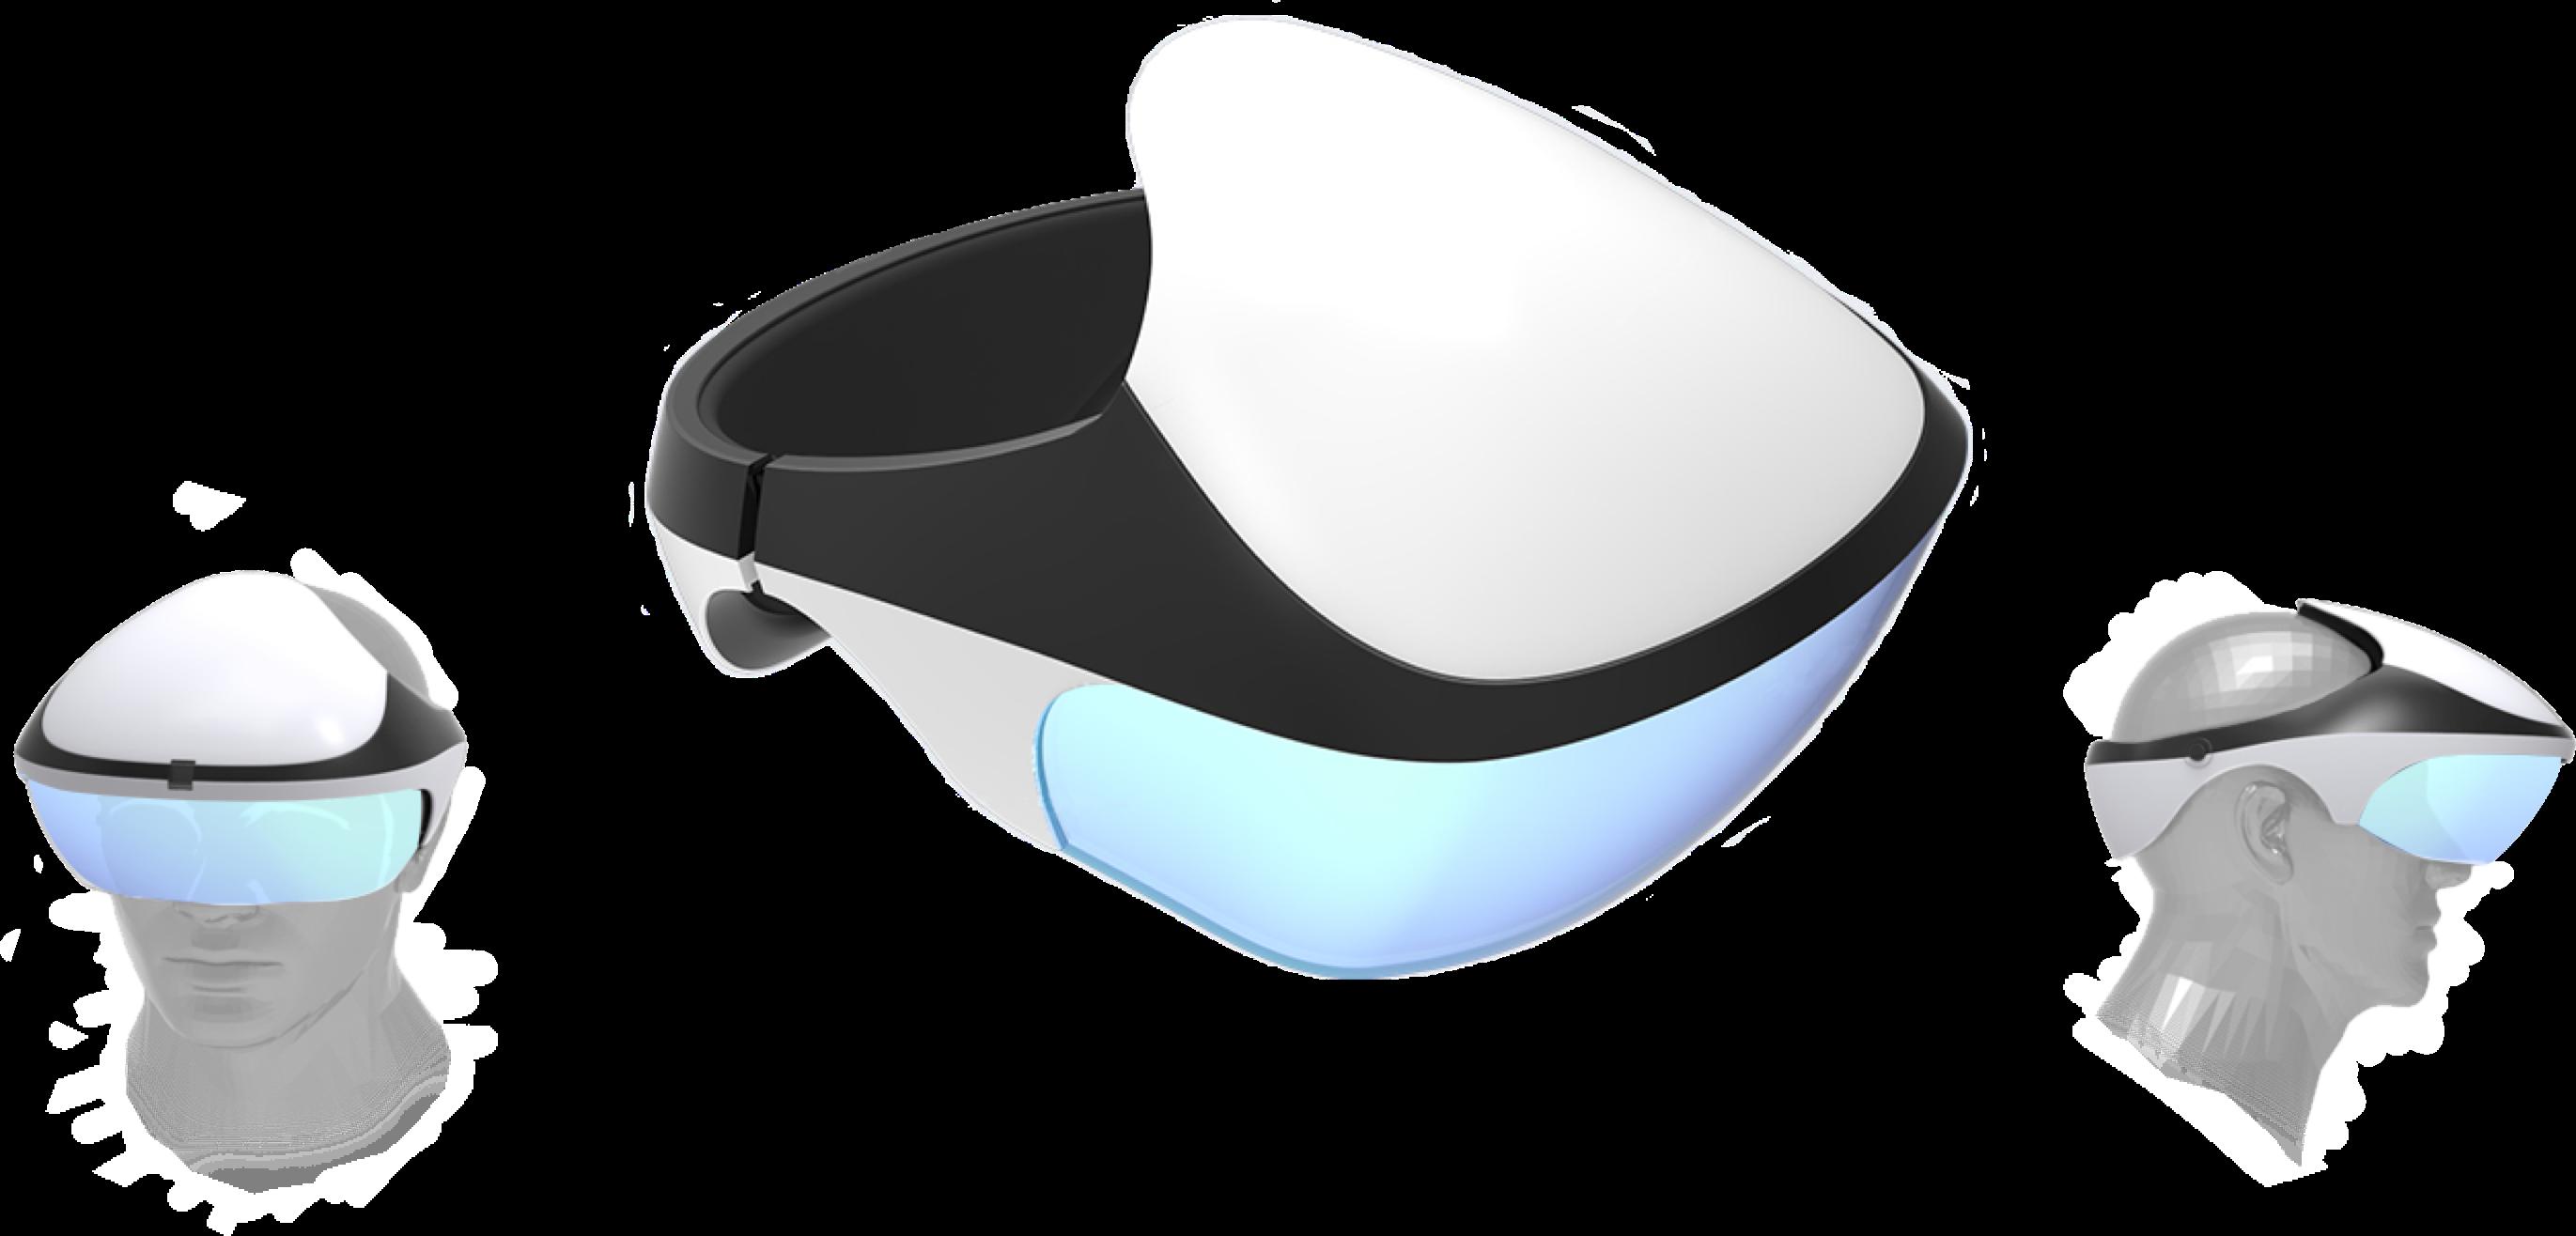 Goggles snorkeling goggles